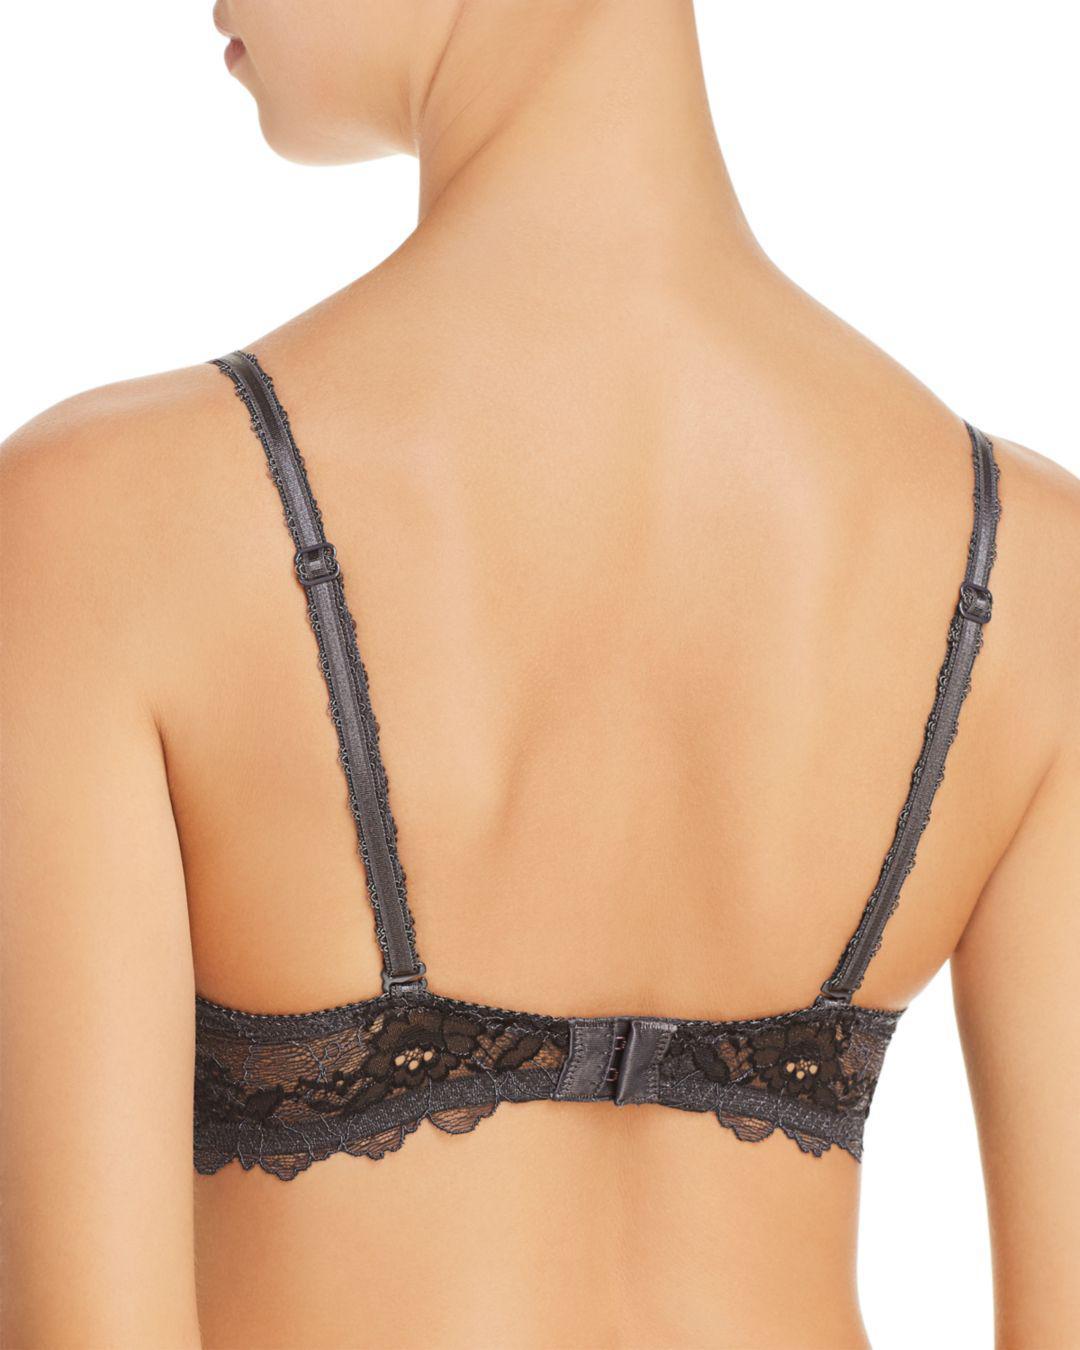 951c3a3fca Lyst - Wacoal Lace Perfection Contour Bra